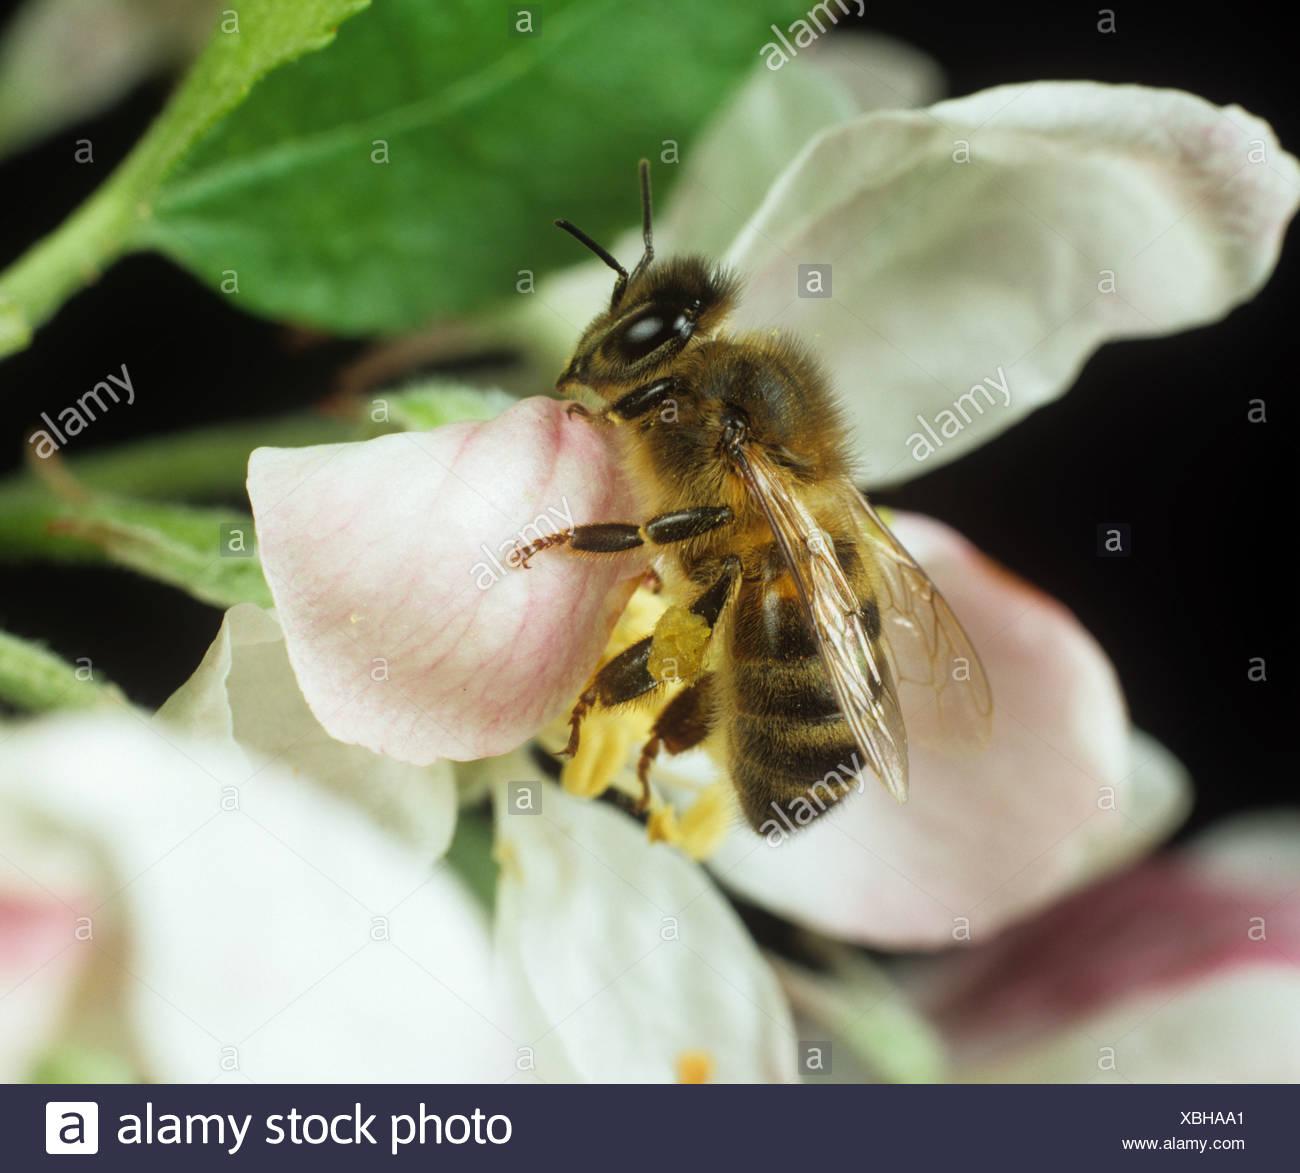 Honey bee Apis mellifera visiting an apple tree flower - Stock Image